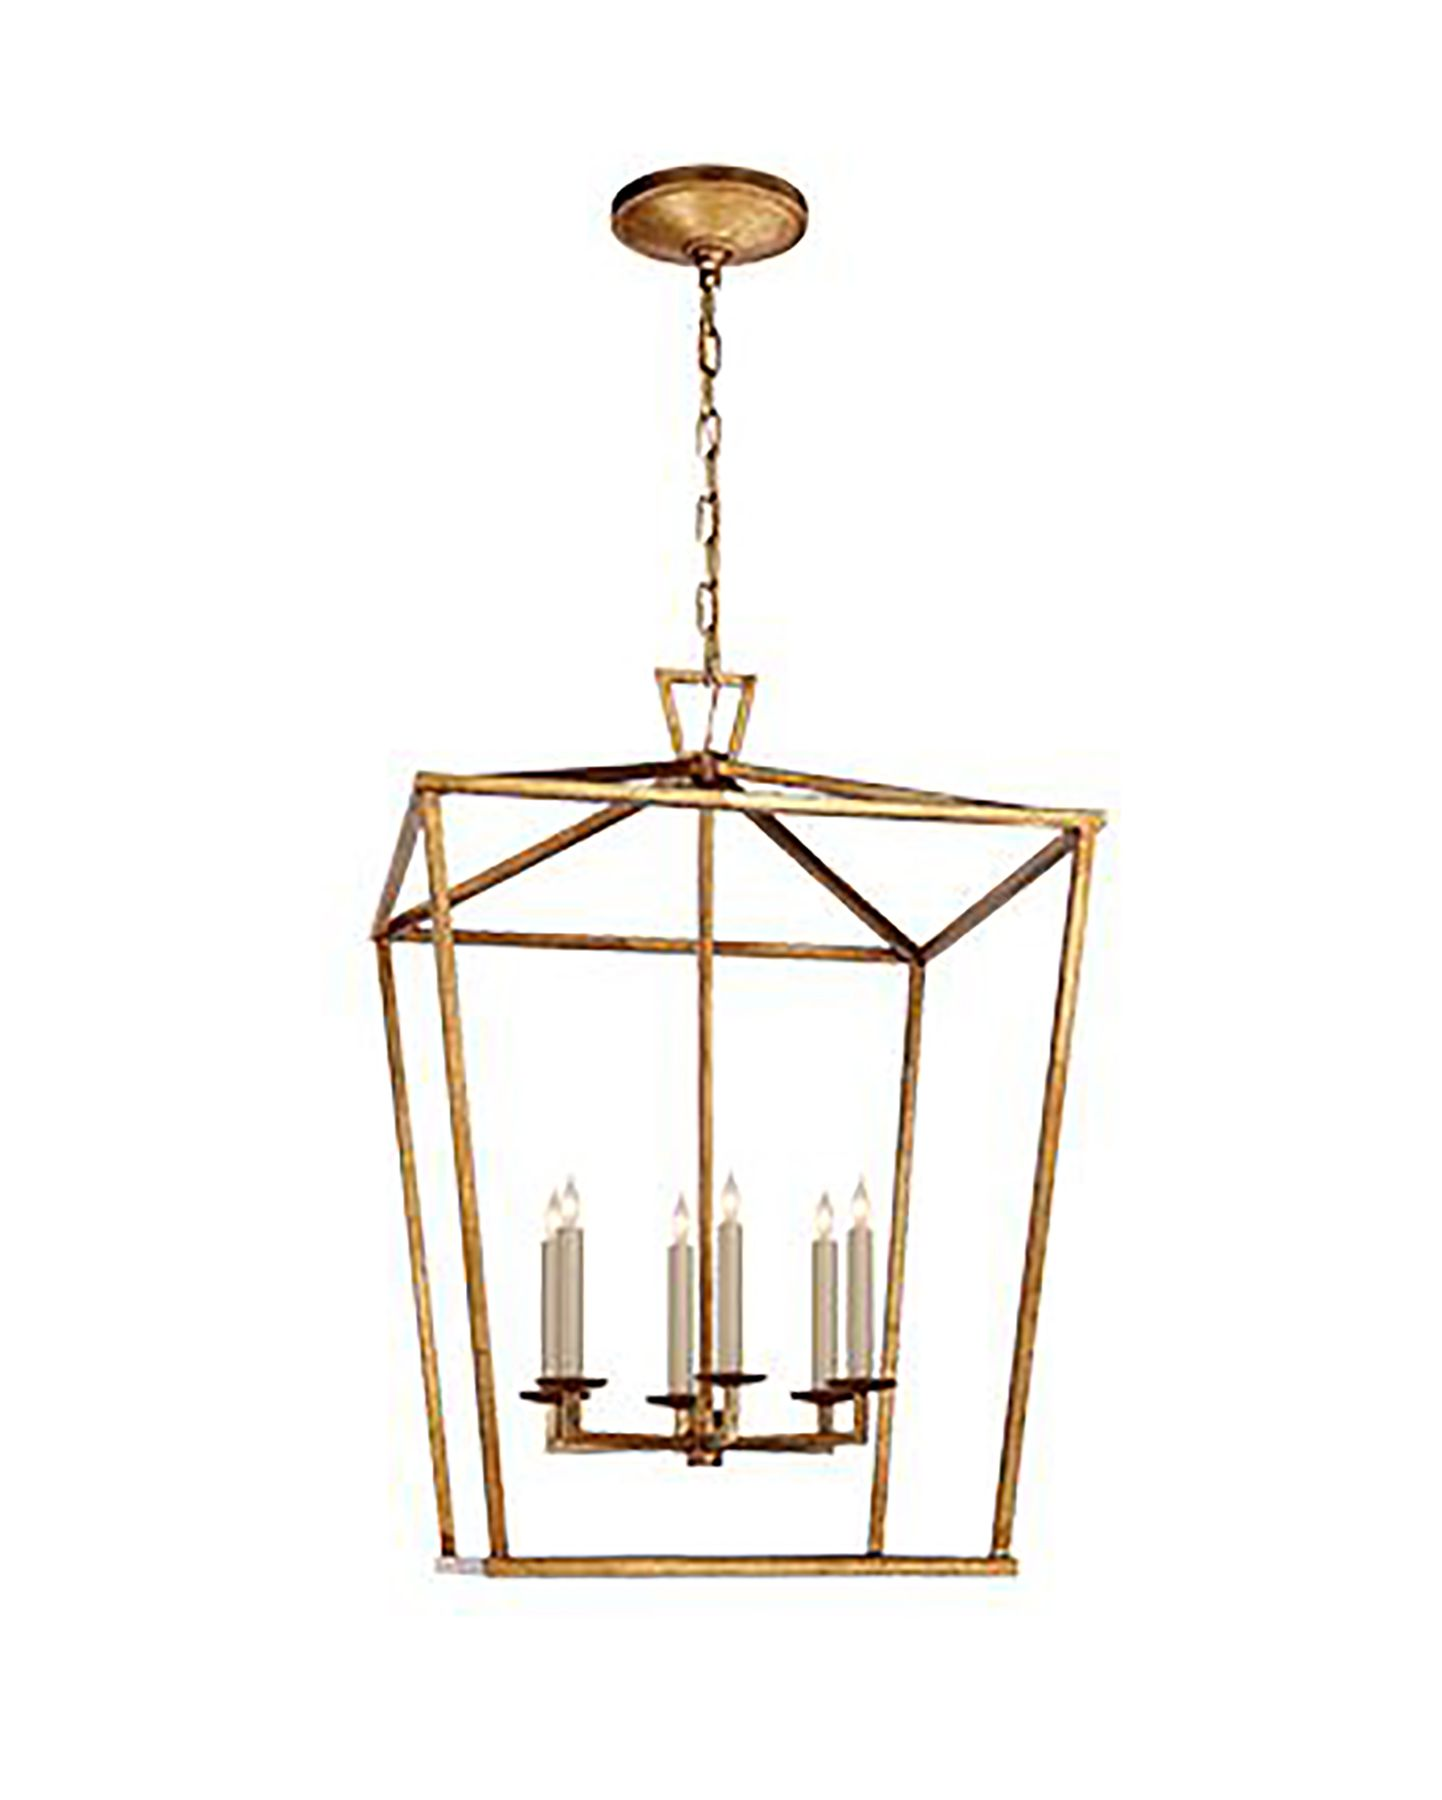 GOT TREND: Our Favorite Light Fixtures - Gottesman ...